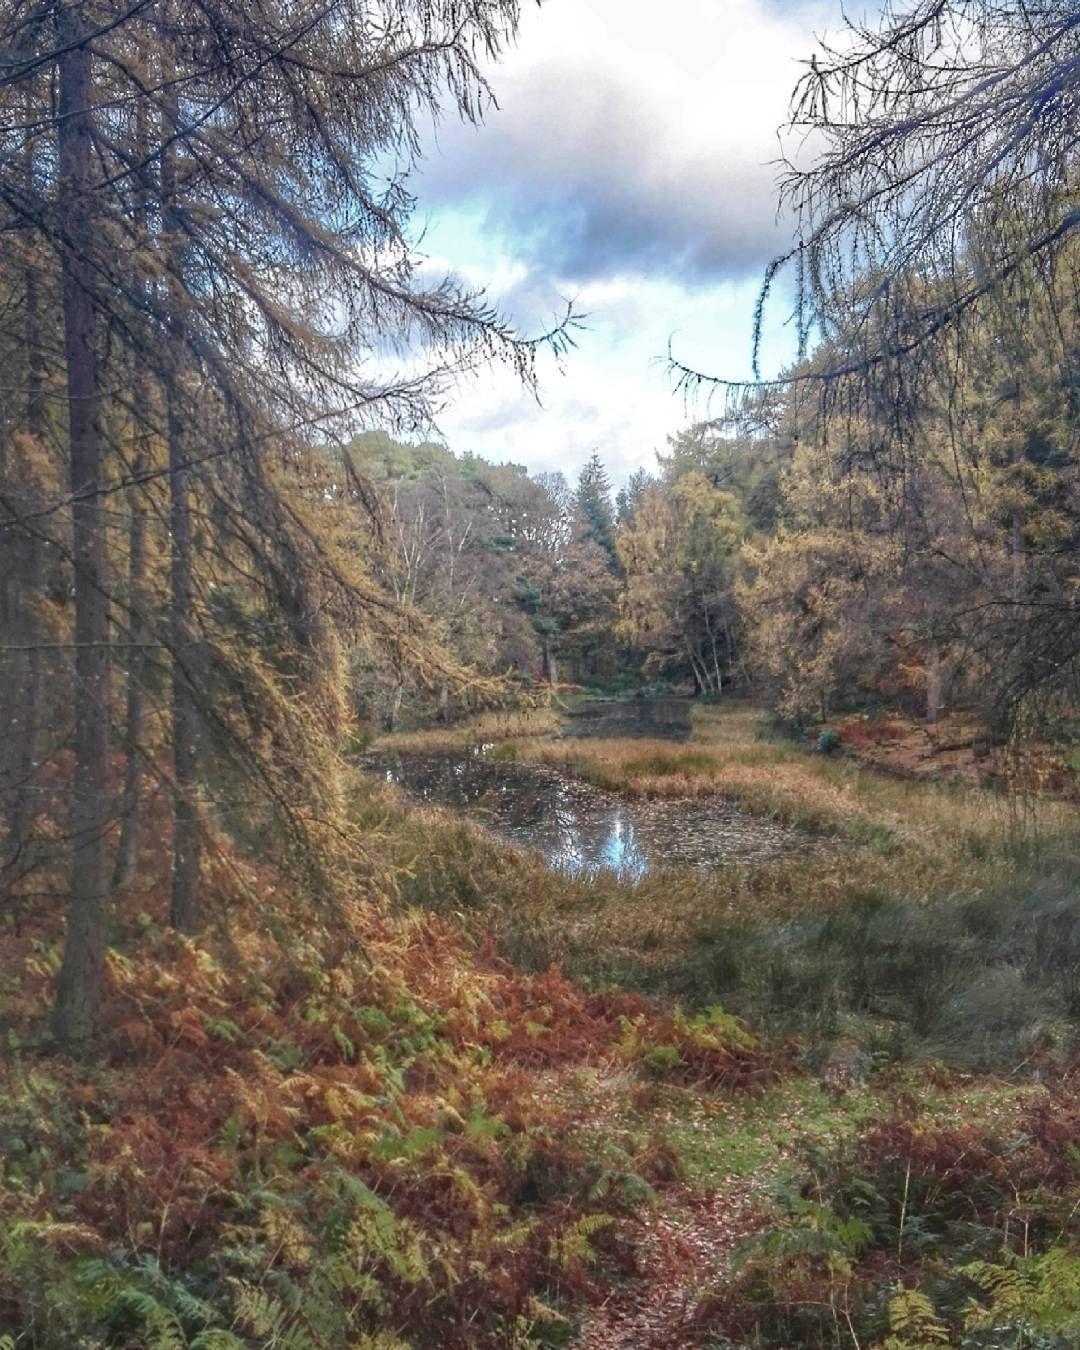 Autumn walks in the English countryside #allenbanks #stawardgorge #victoriangardens #englishparks #northumberland #nationaltrust #landscape #landscaping #tarn #hiking #walking #mountains #hikingadventures